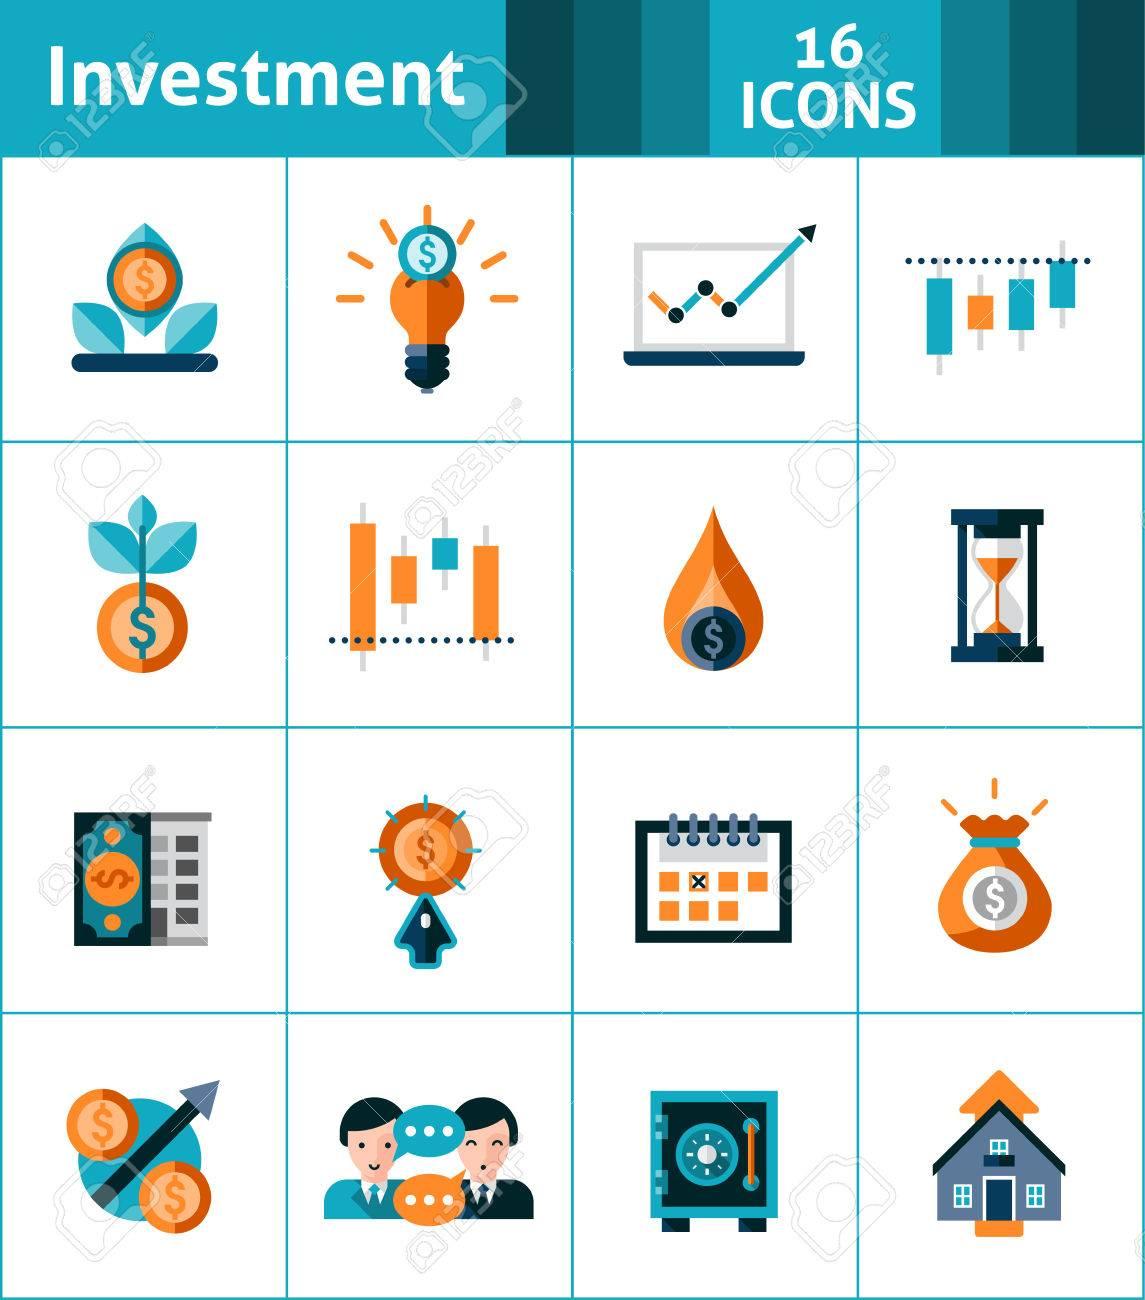 Investment Icons Set With Market Analysis Stock Exchange Symbols